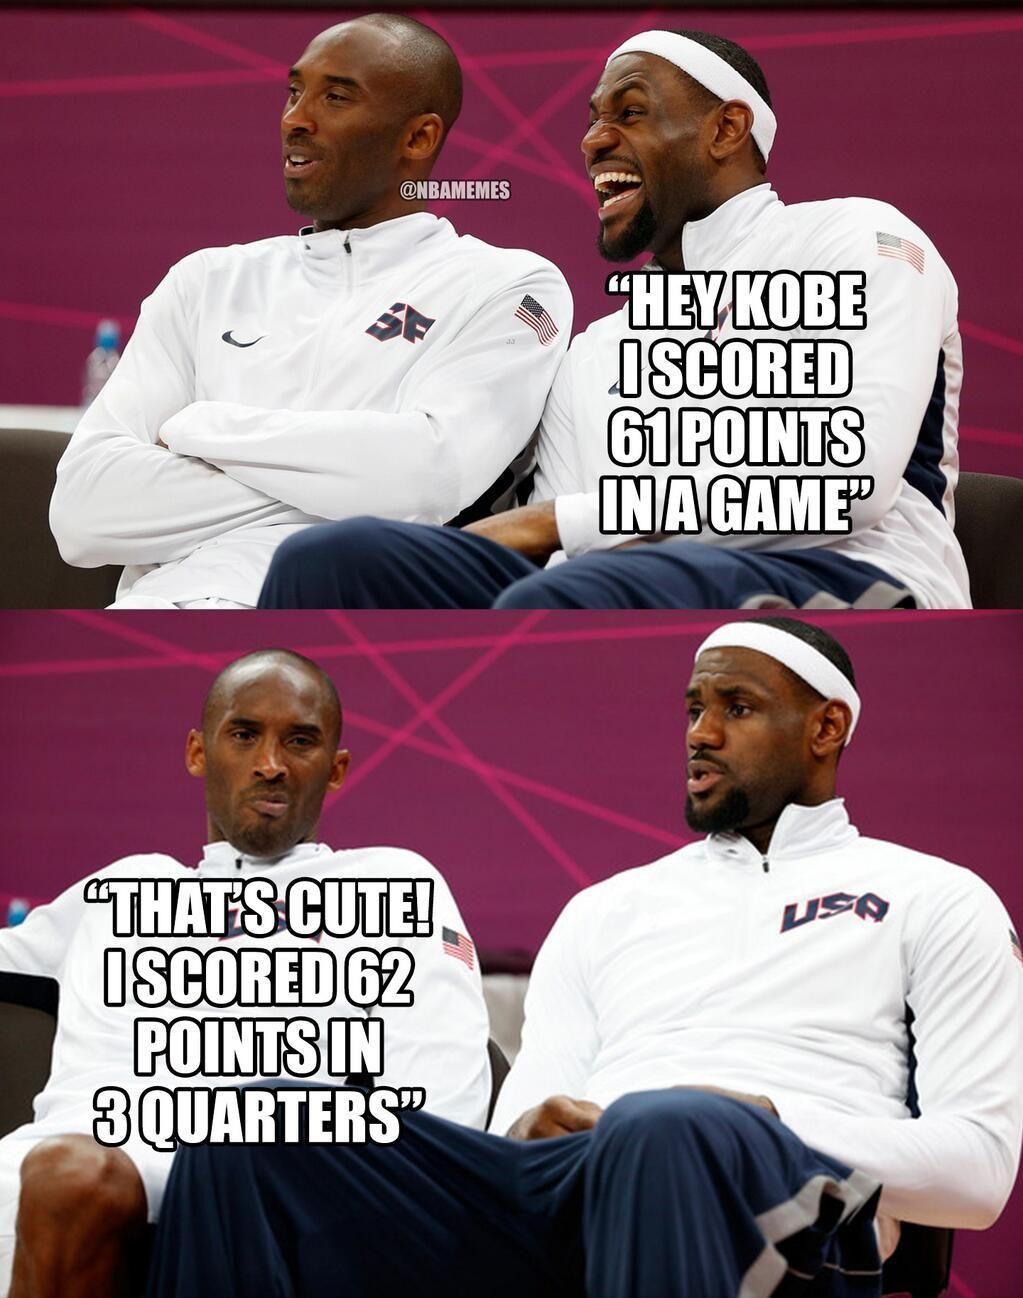 7000e1f3a0a NBAMemes  Kobe Bryant vs. LeBron James!